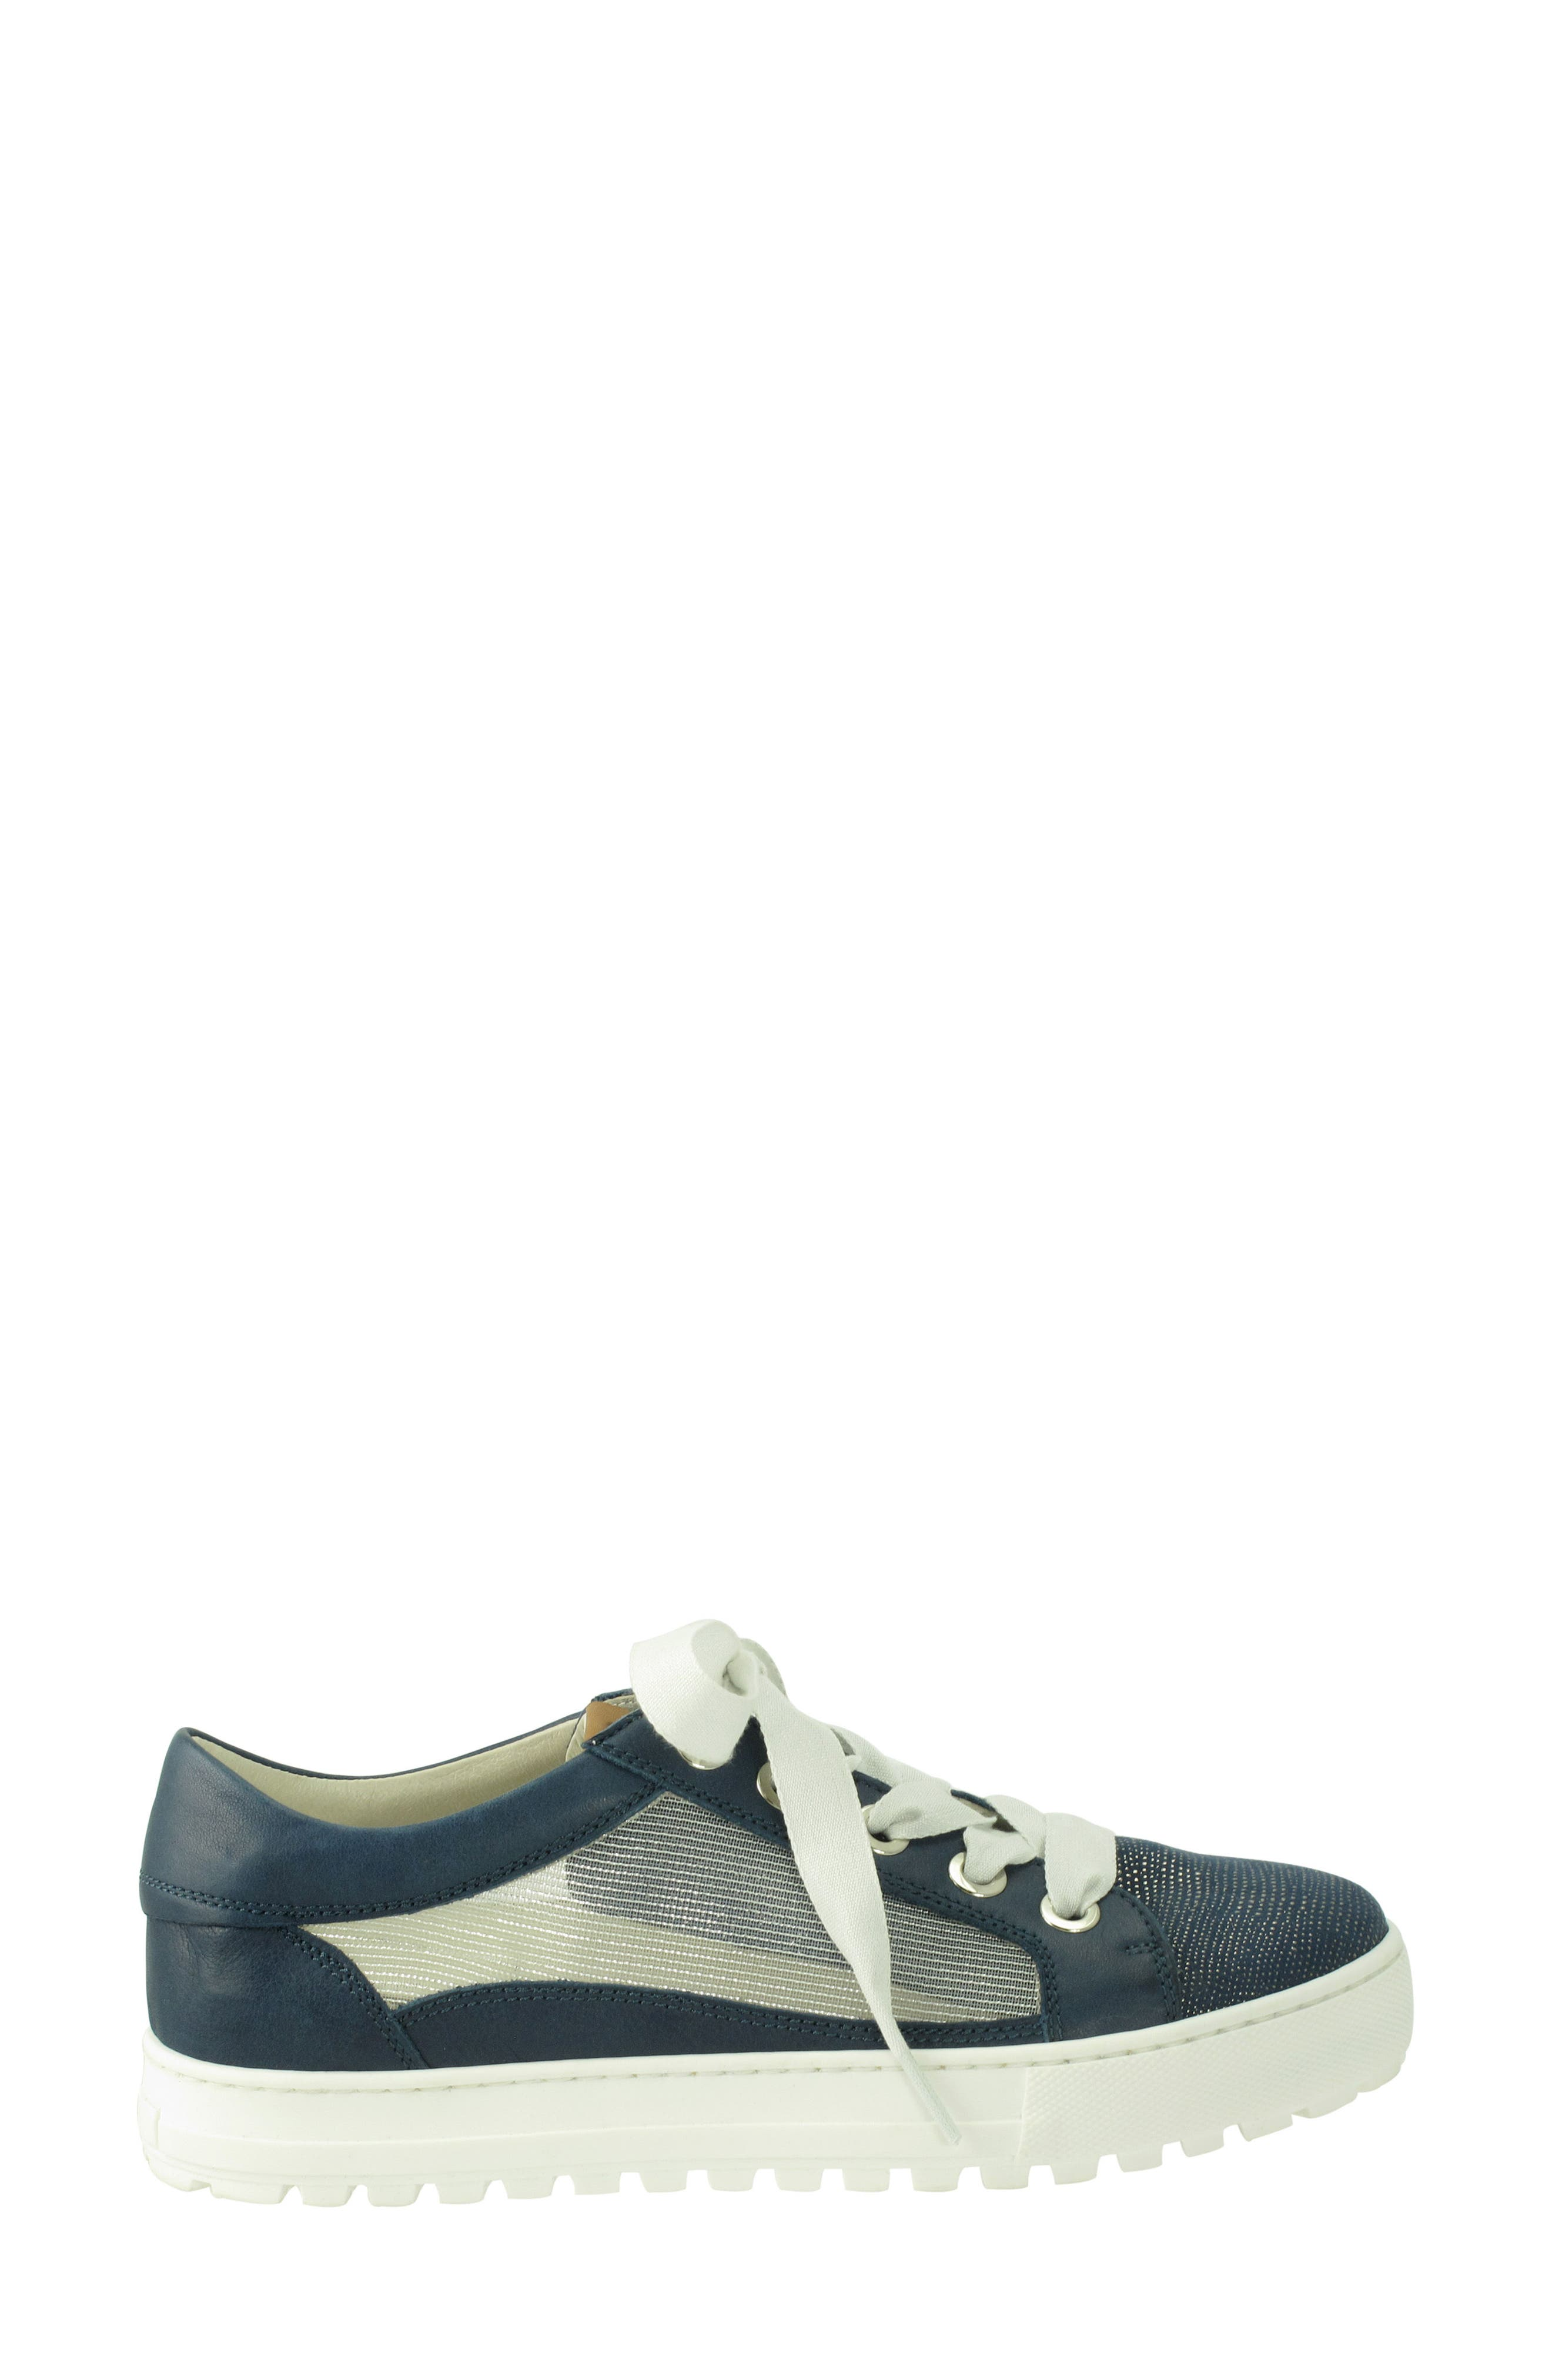 Layton Sneaker,                             Alternate thumbnail 3, color,                             400